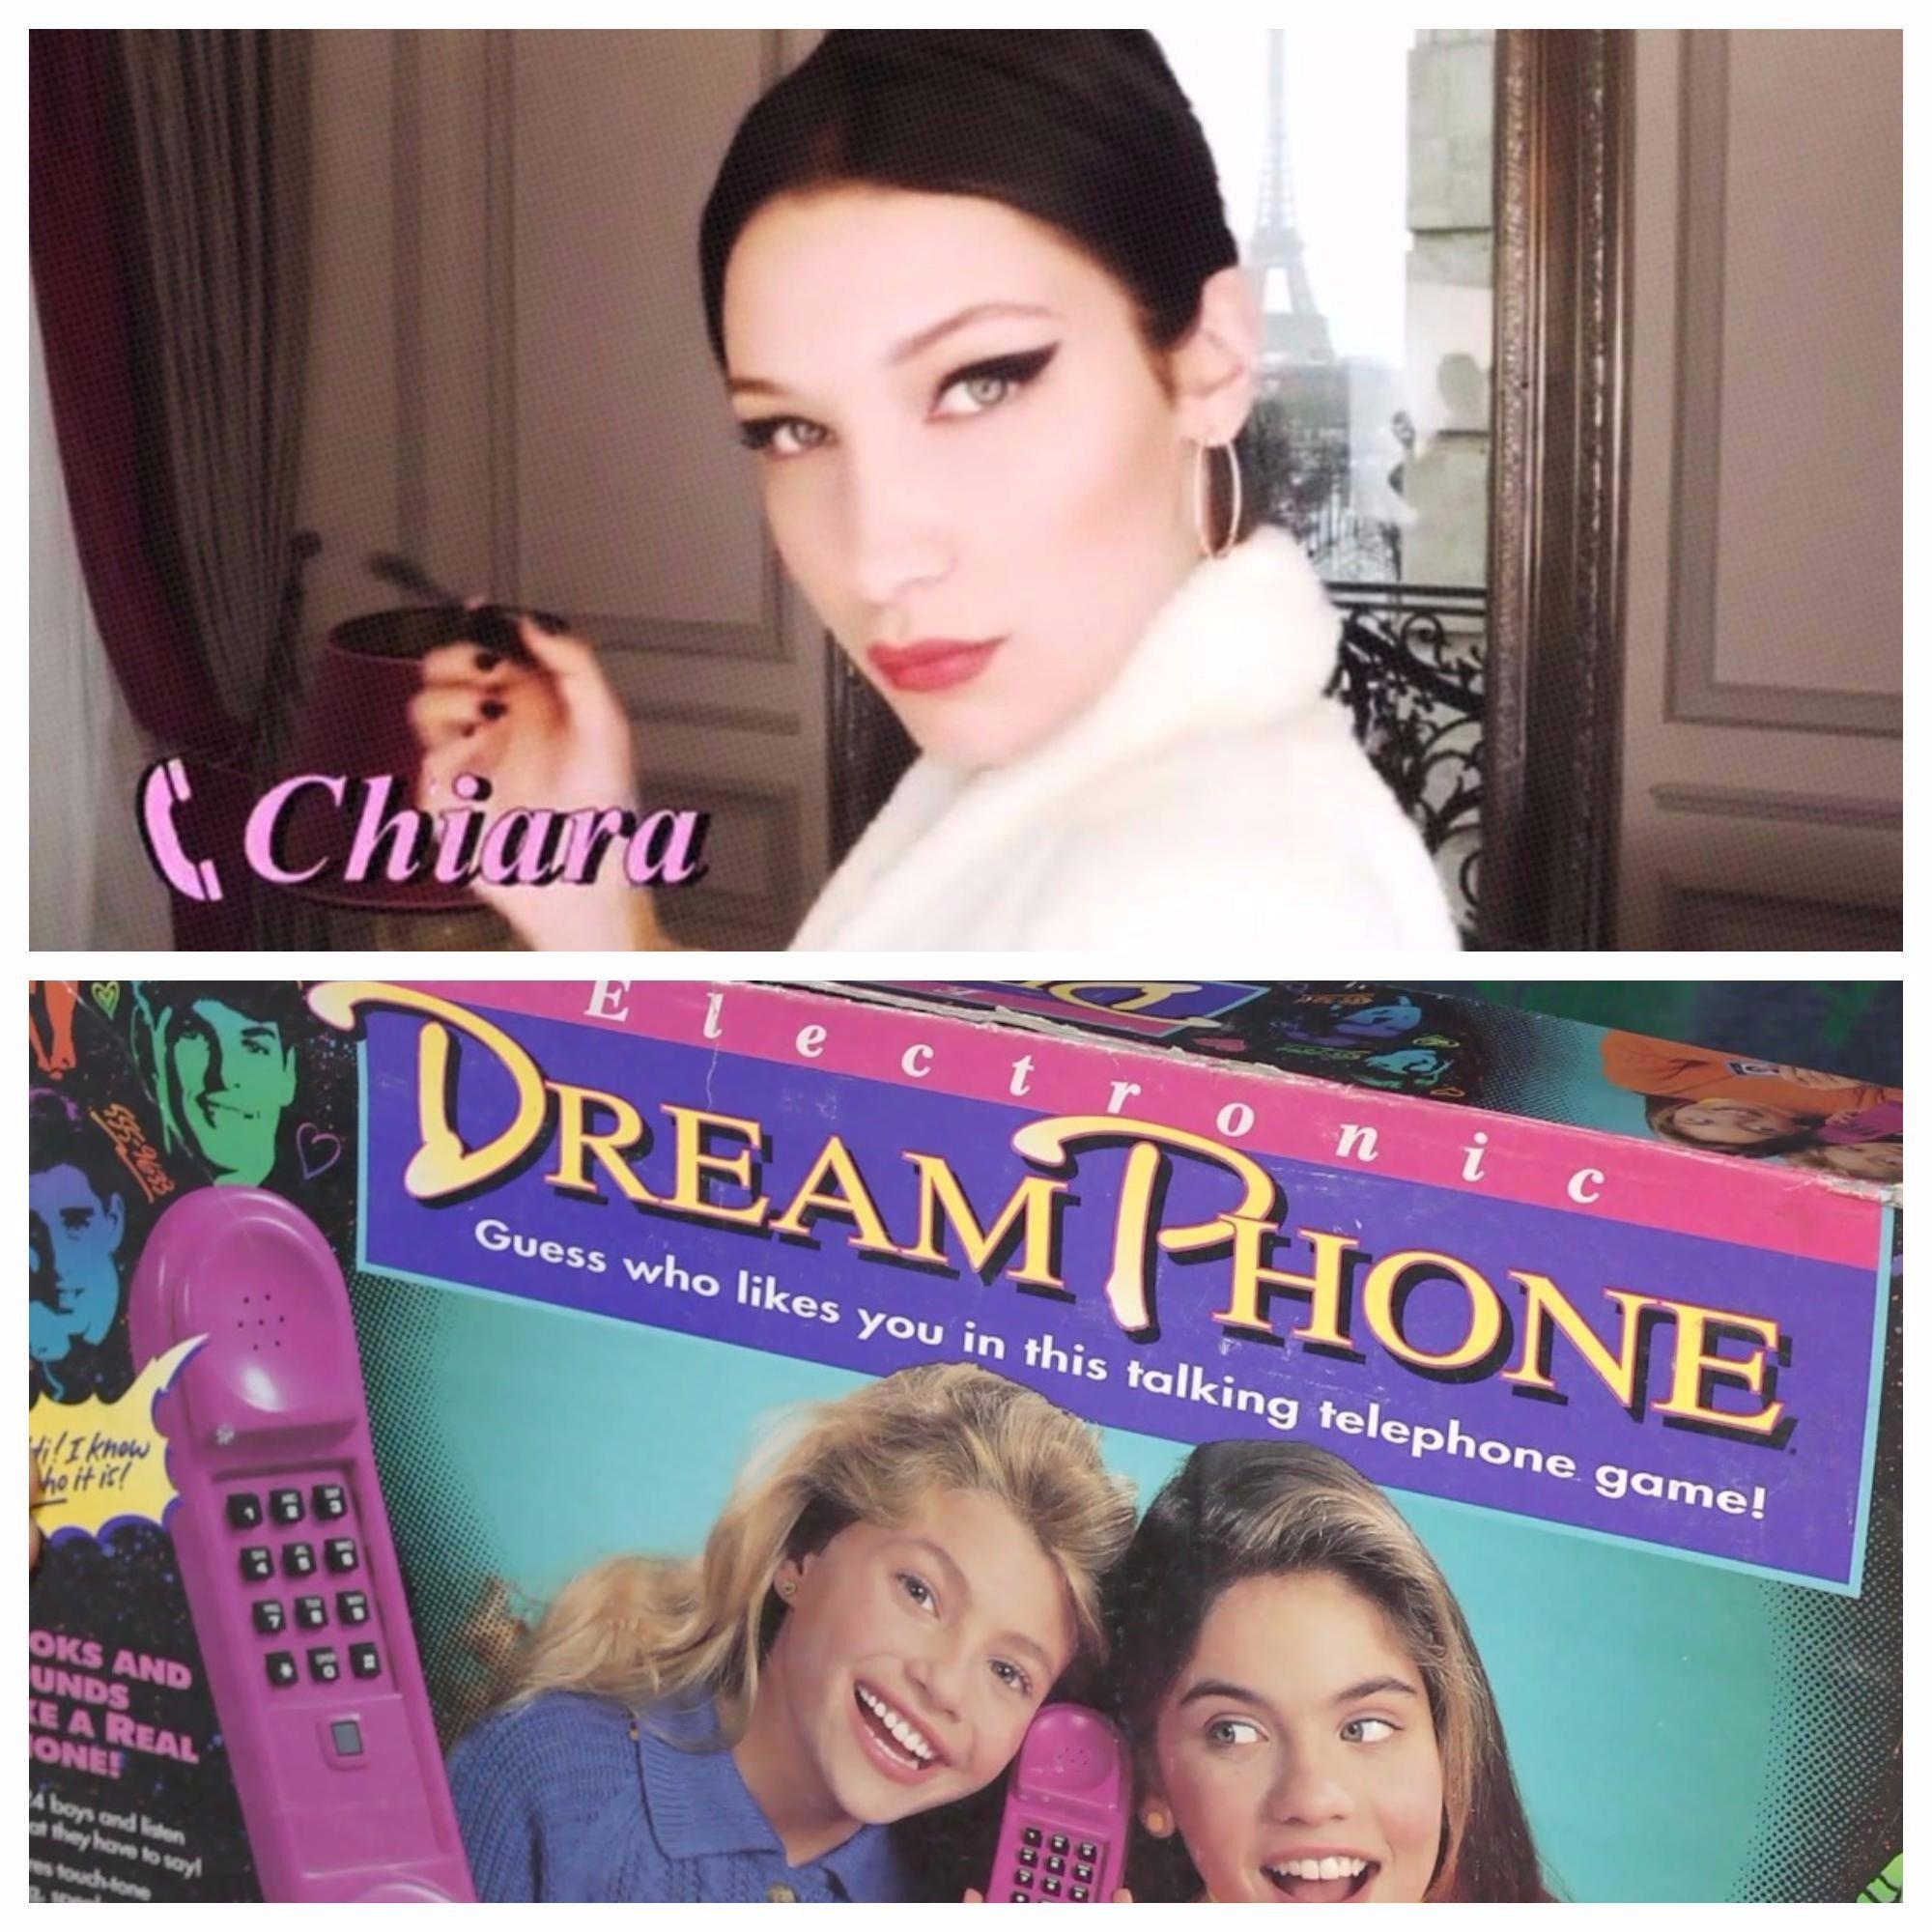 Bella Hadid And Chiara Ferragni Star In Dior's New Campaign And It's Giving Us 'Dream Phone'